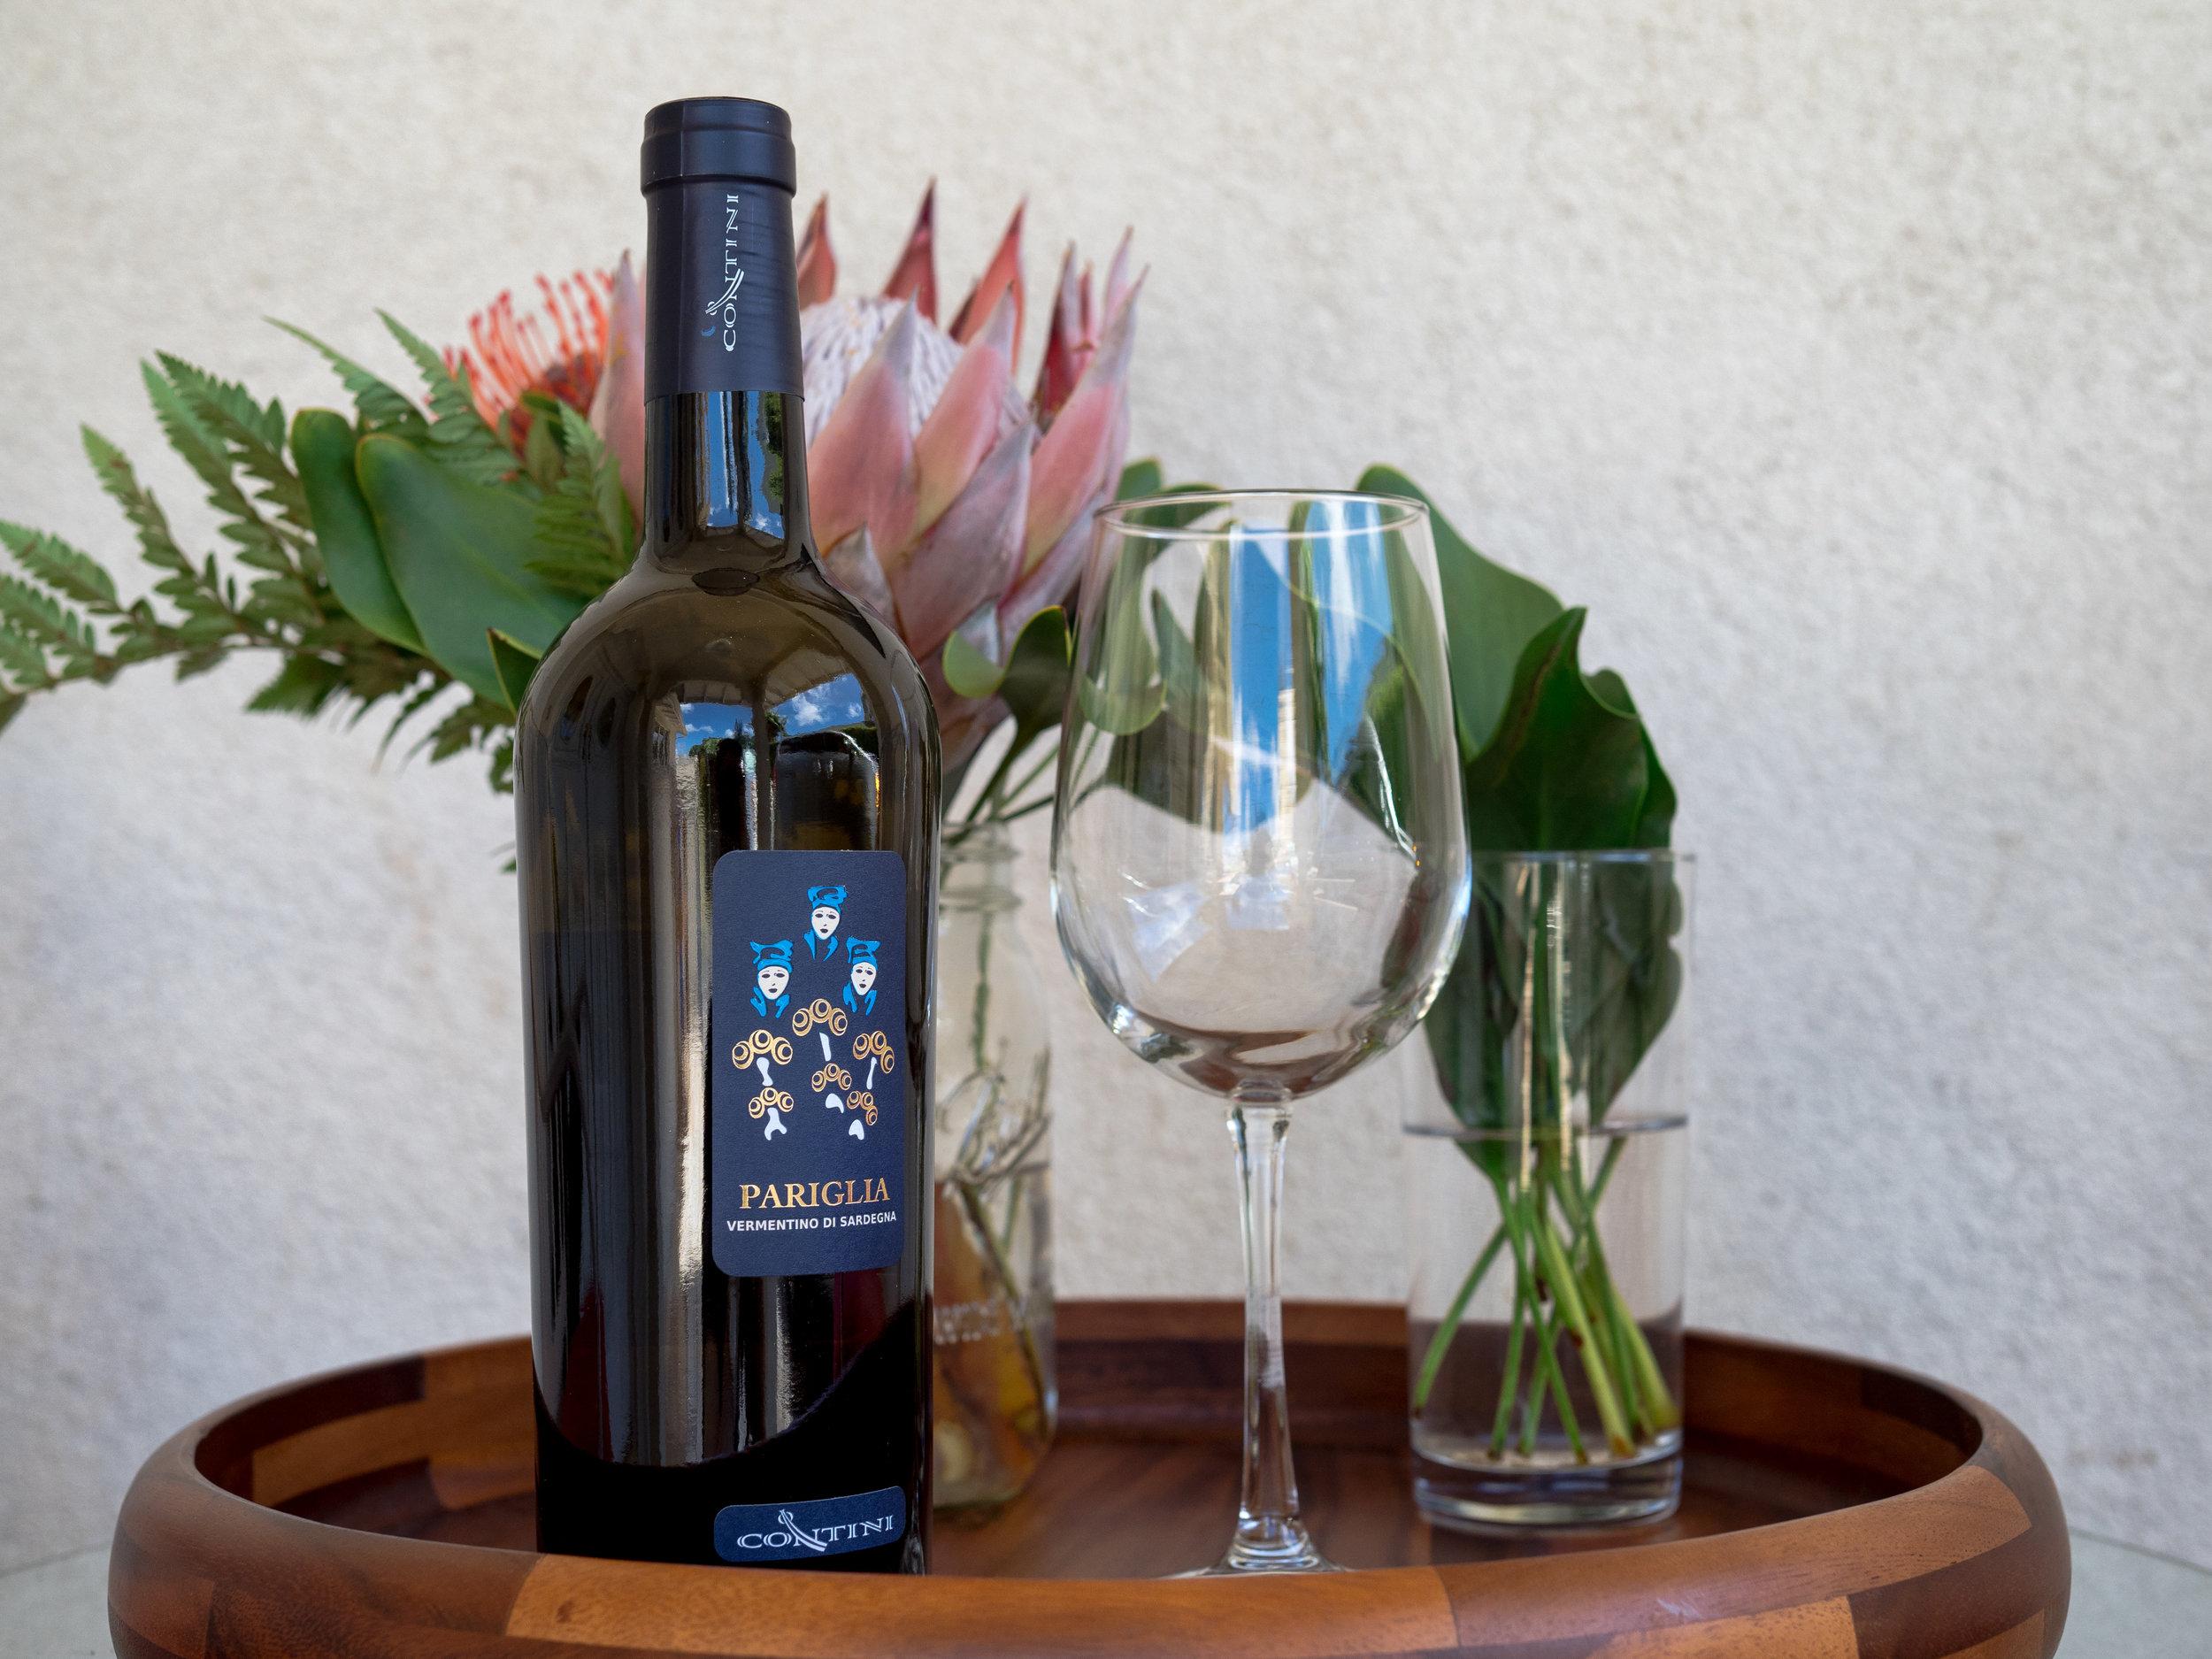 The Italian selection from Sardinia, available for $14 at Fukioka's Wine Times